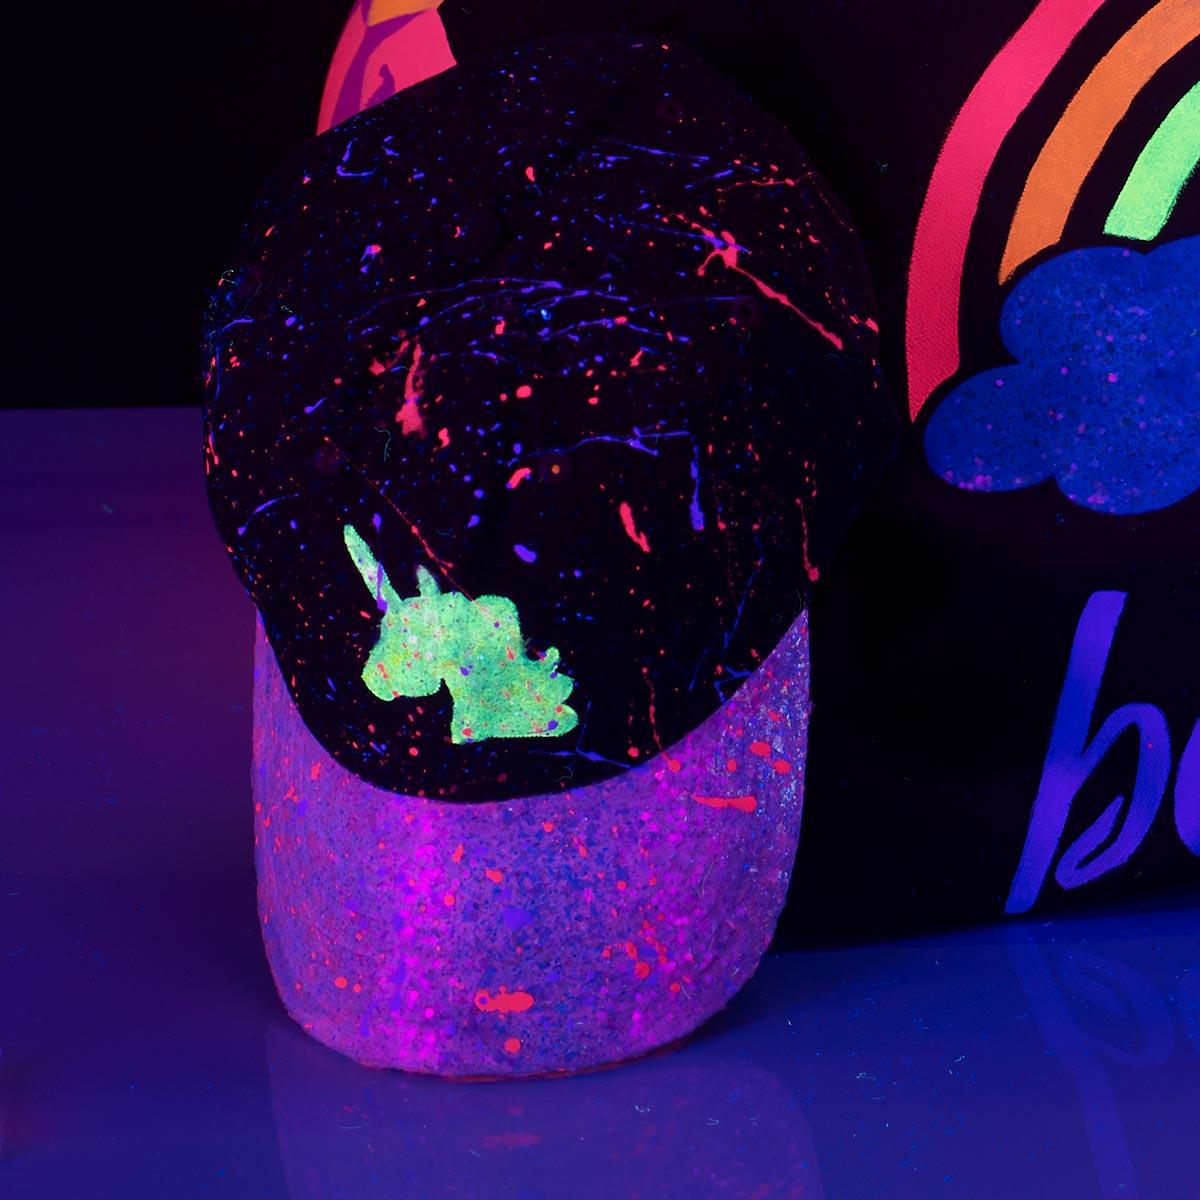 DIY Glow-in-the-Dark Cap